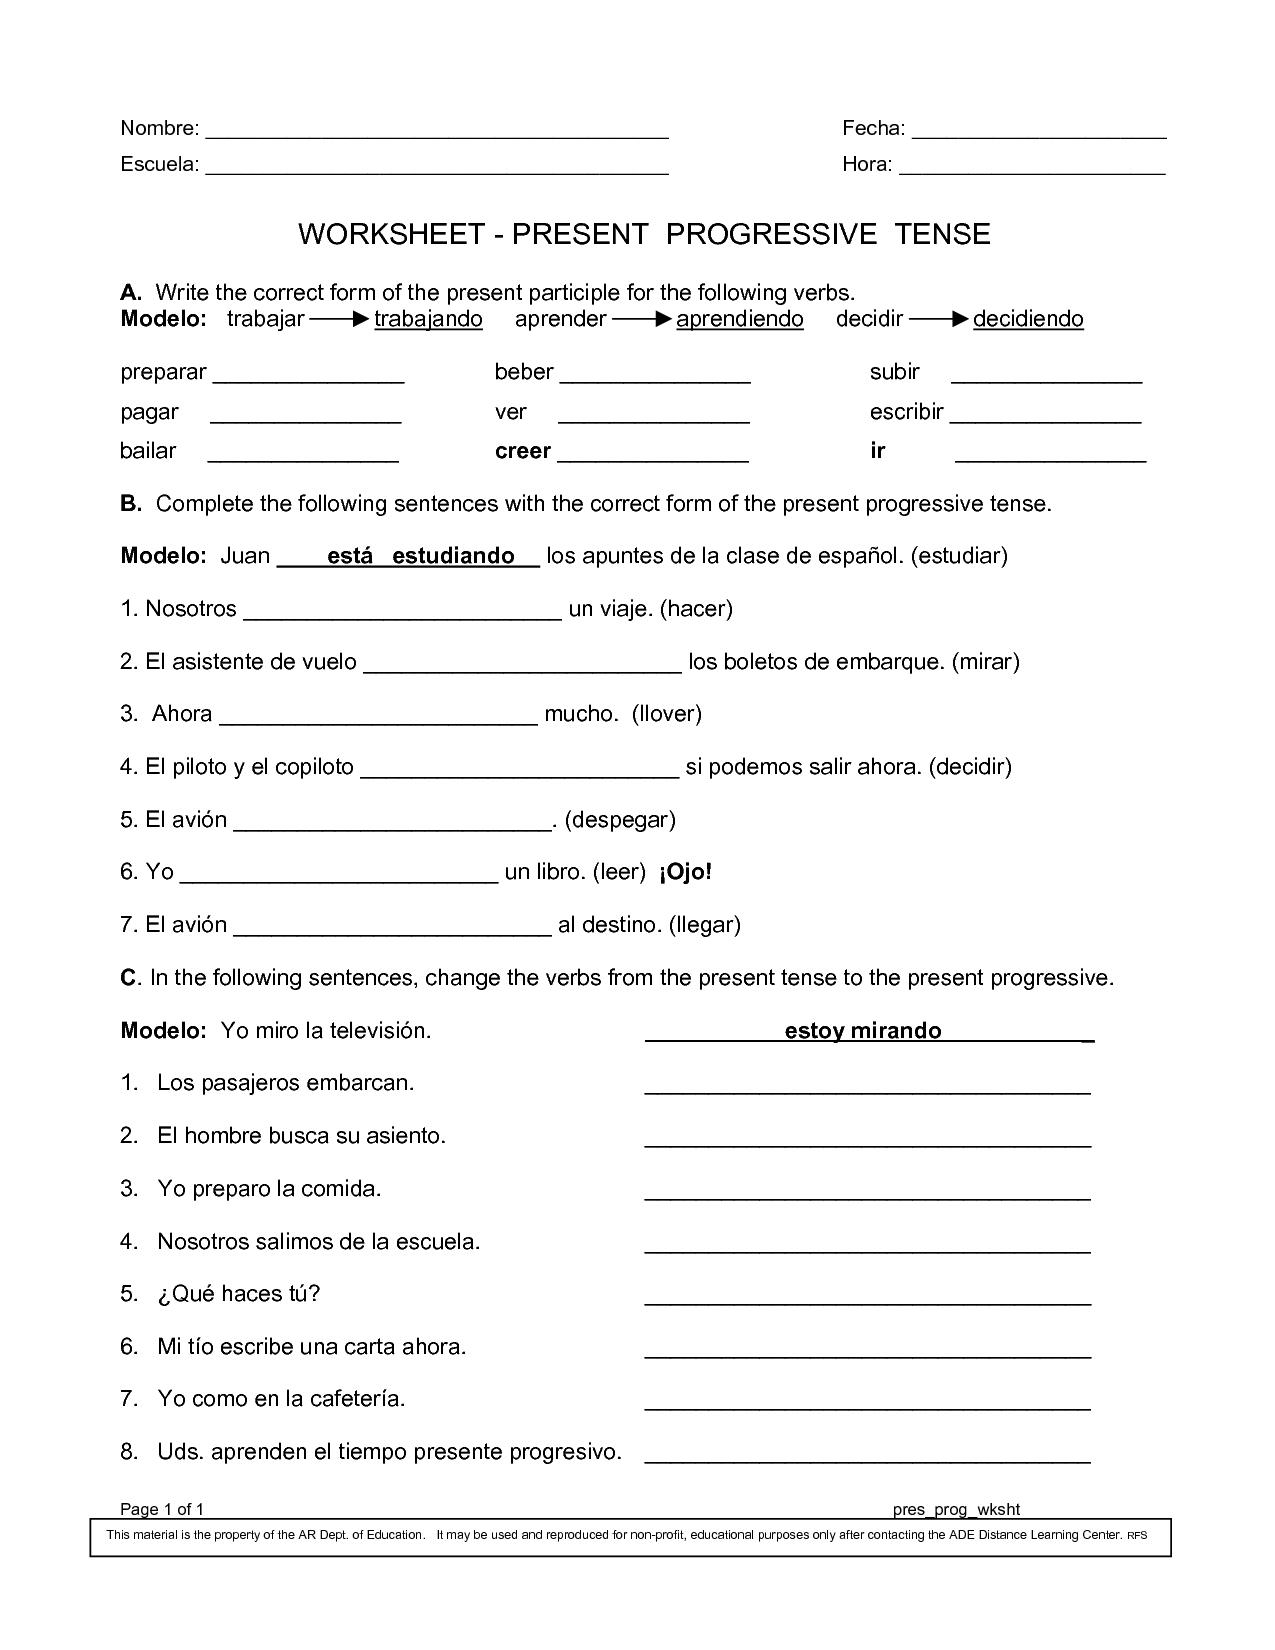 Spanish Worksheets Printables | Present Progressive Worksheet | Present Progressive Worksheets Printable